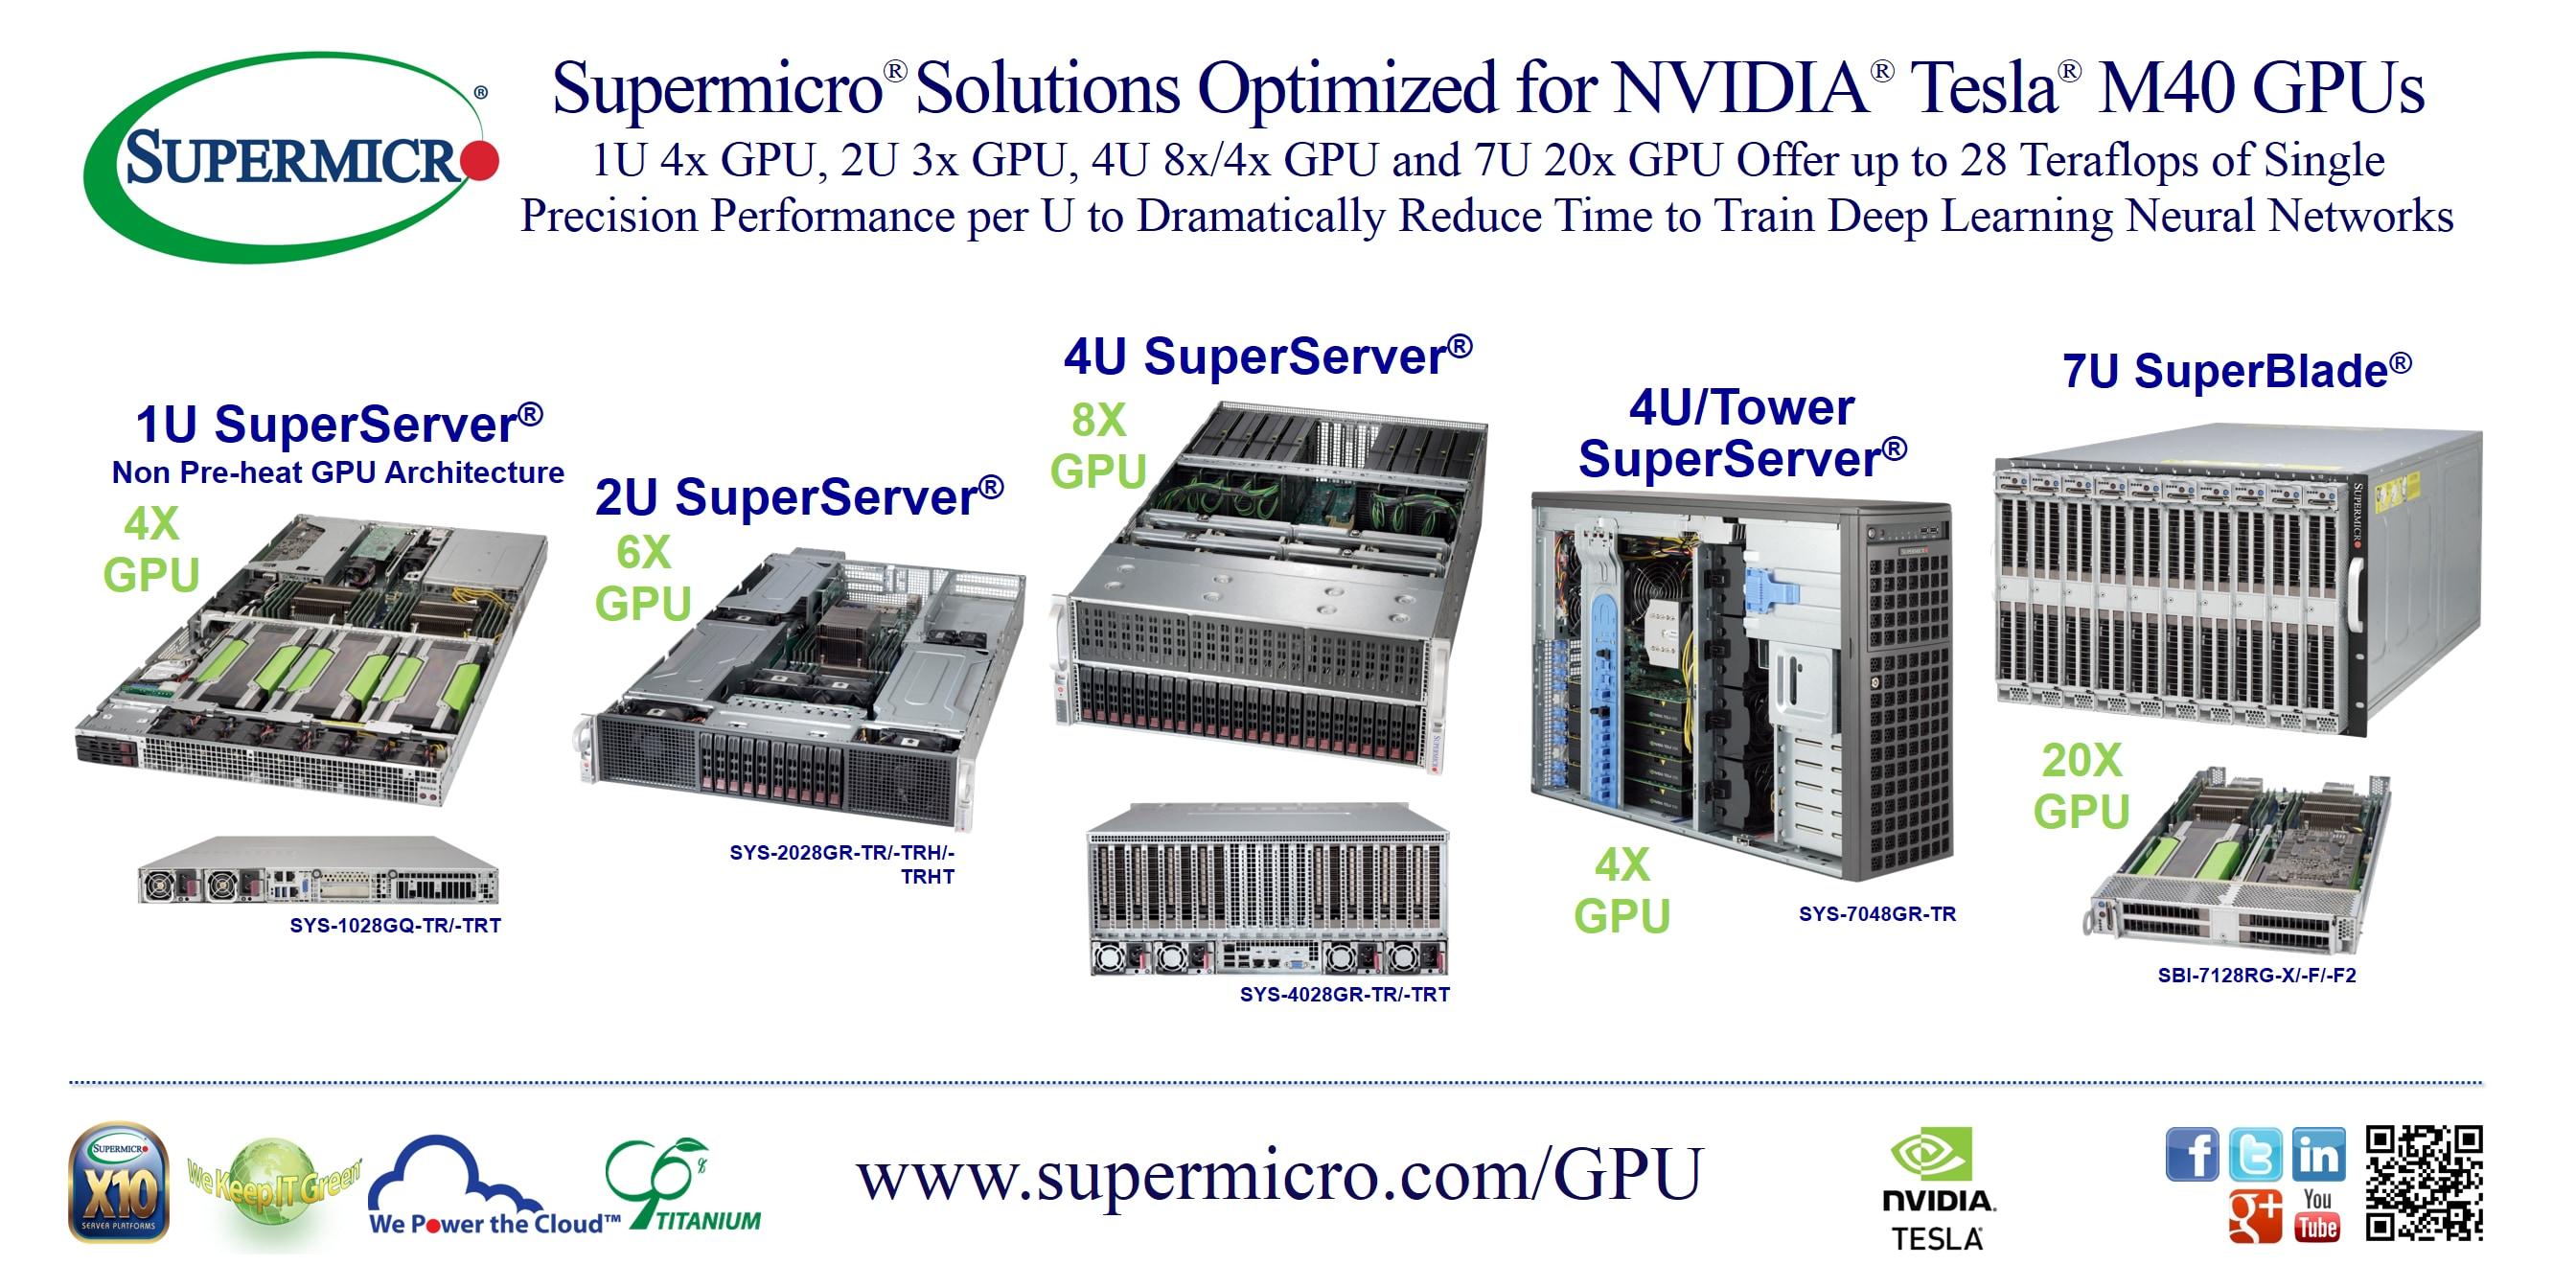 Supermicro | News | Supermicro® 1U-4U GPU SuperServers and